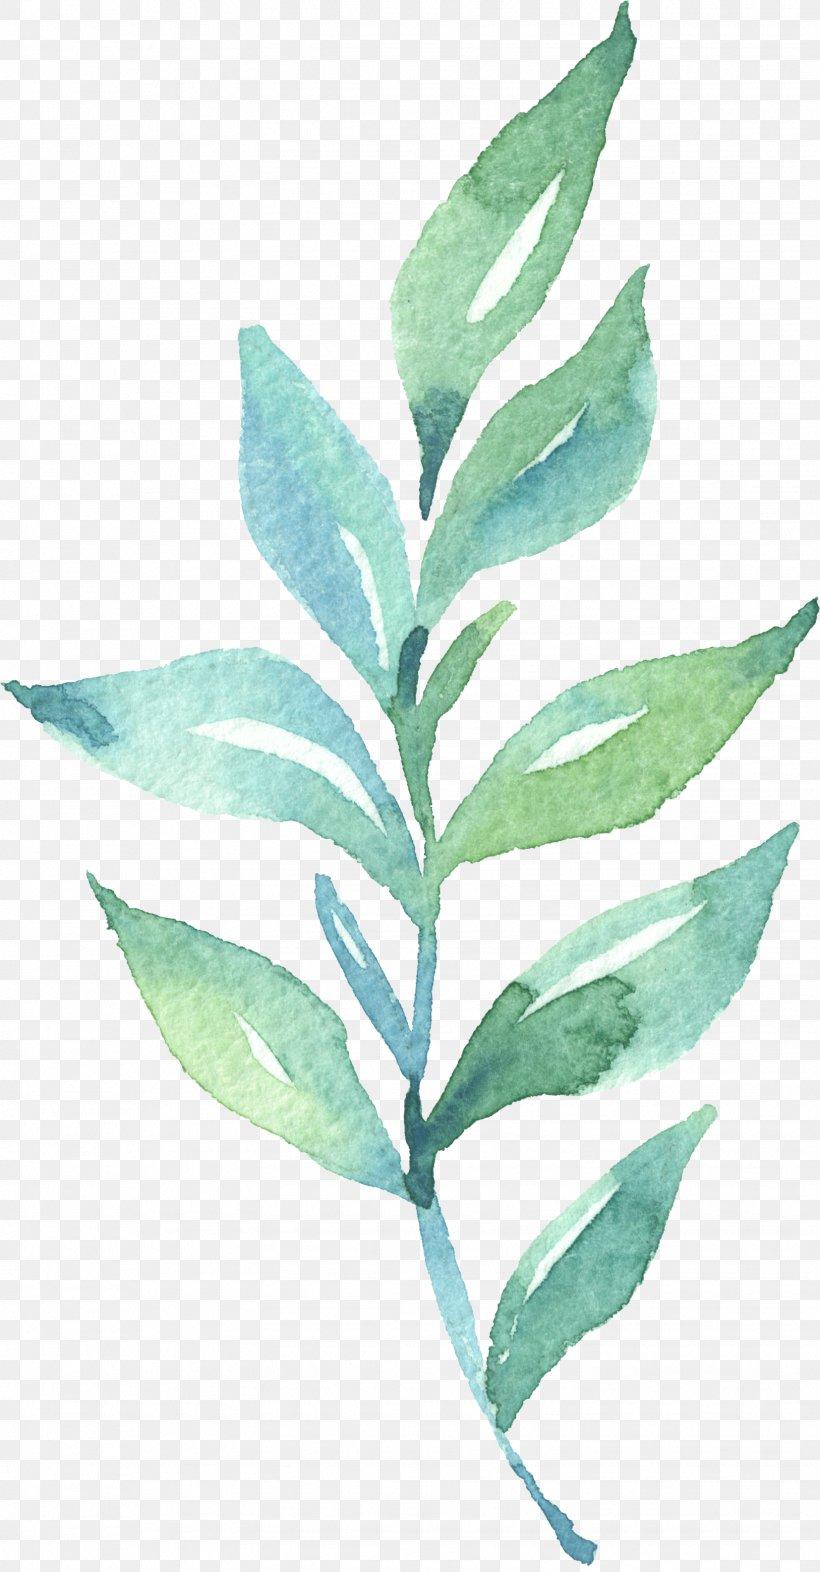 Leaf Watercolor Painting, PNG, 1626x3118px, Leaf, Art, Branch, Canvas, Media Descriptor File Download Free